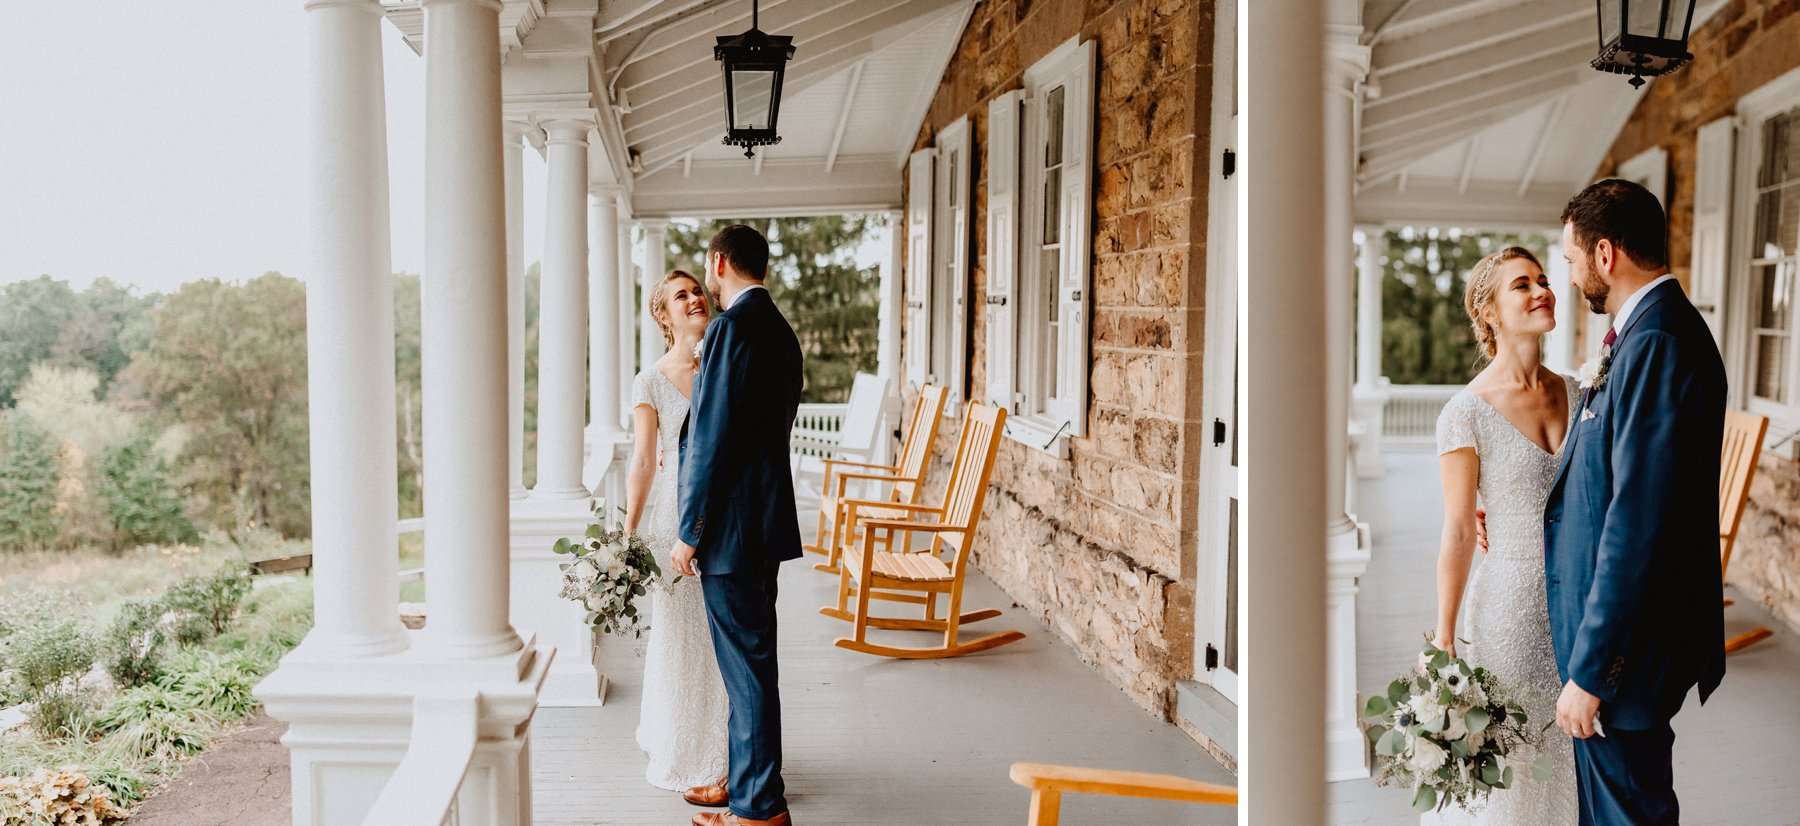 John_James_Audubon_Center_wedding-58.jpg